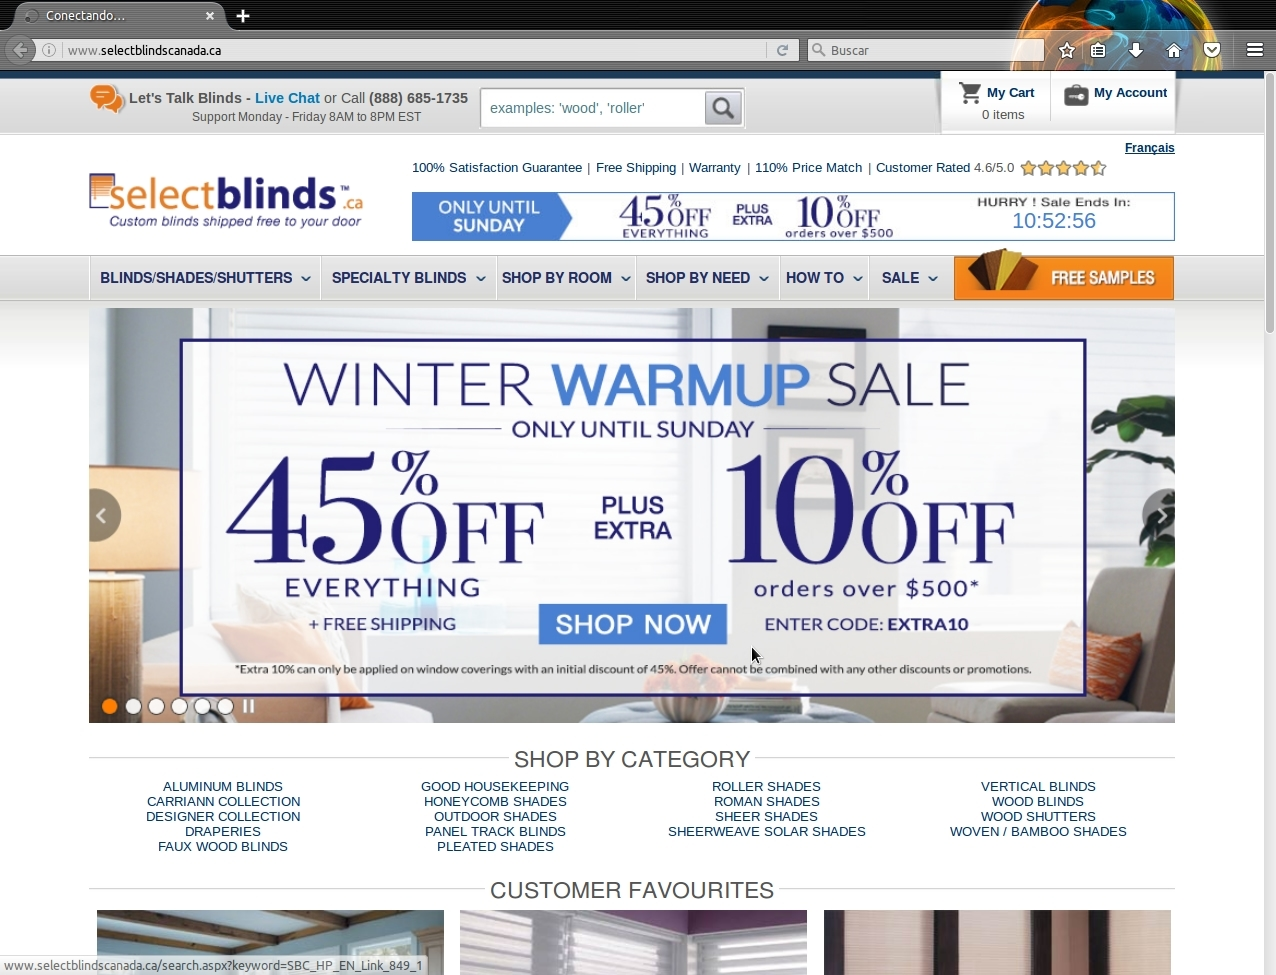 Select blinds coupon code